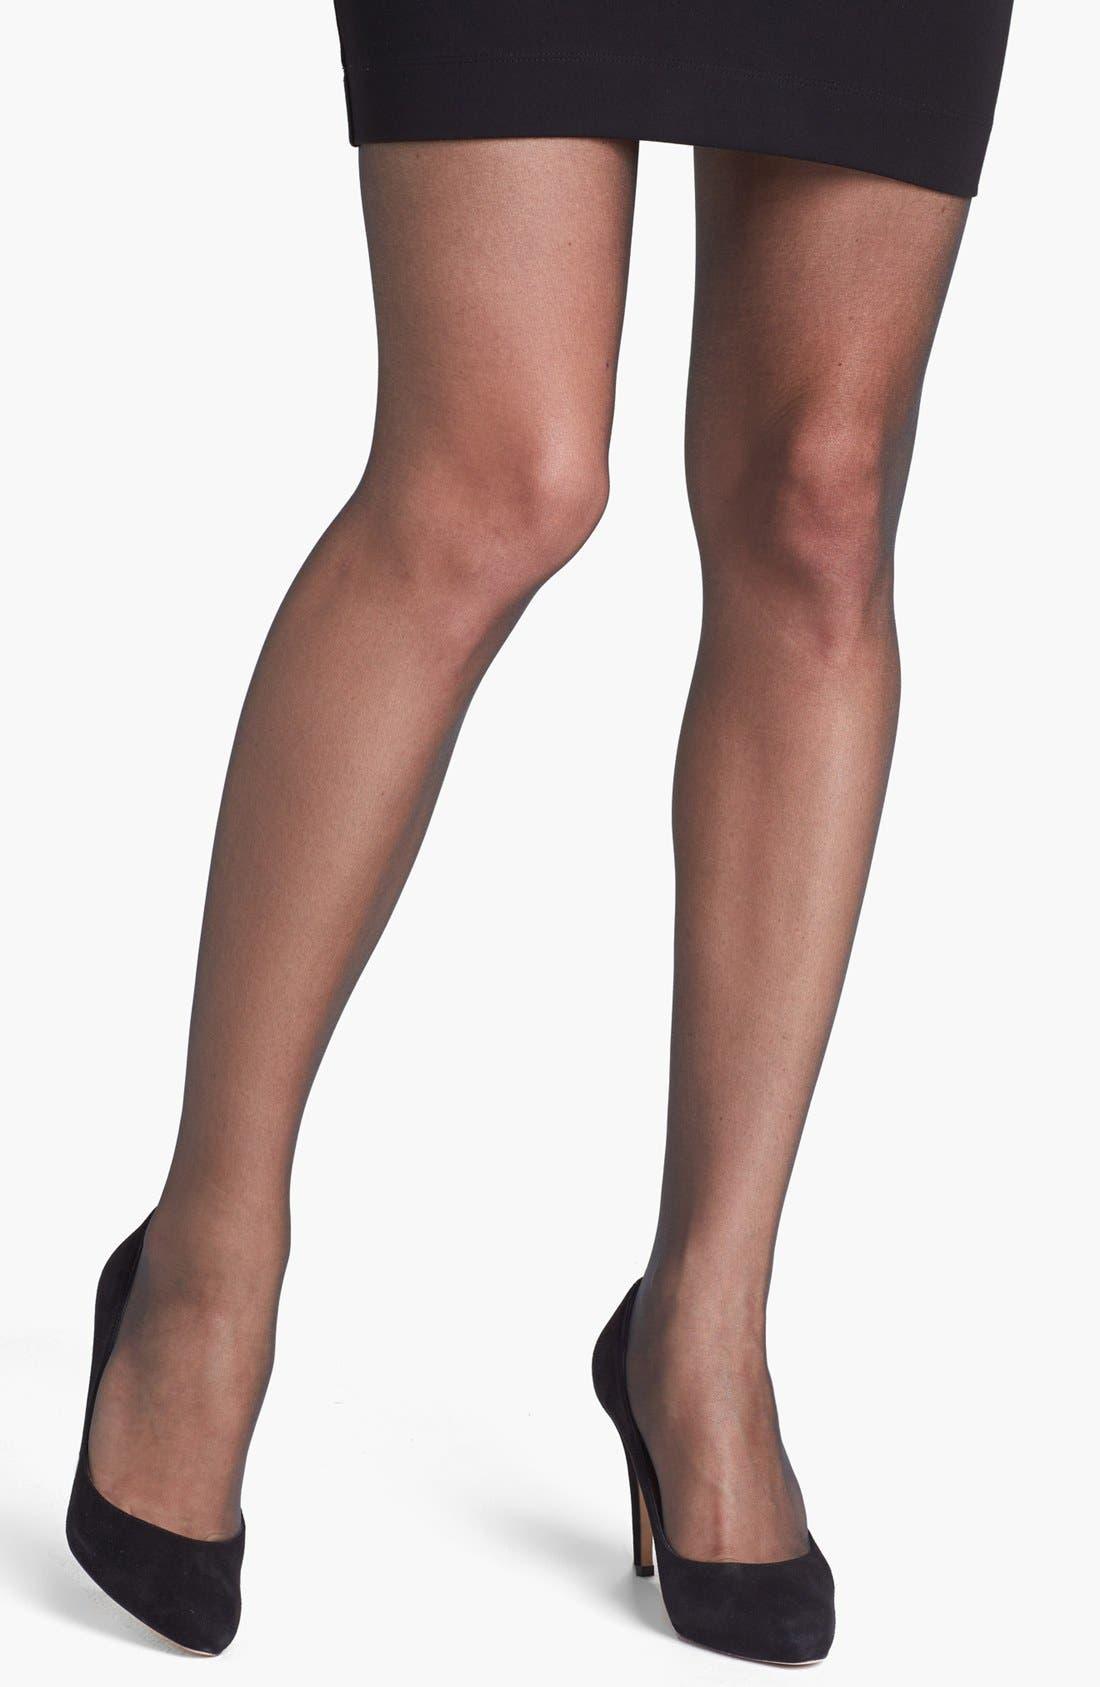 Main Image - Calvin Klein 'Infinite Sheer' Control Top Pantyhose